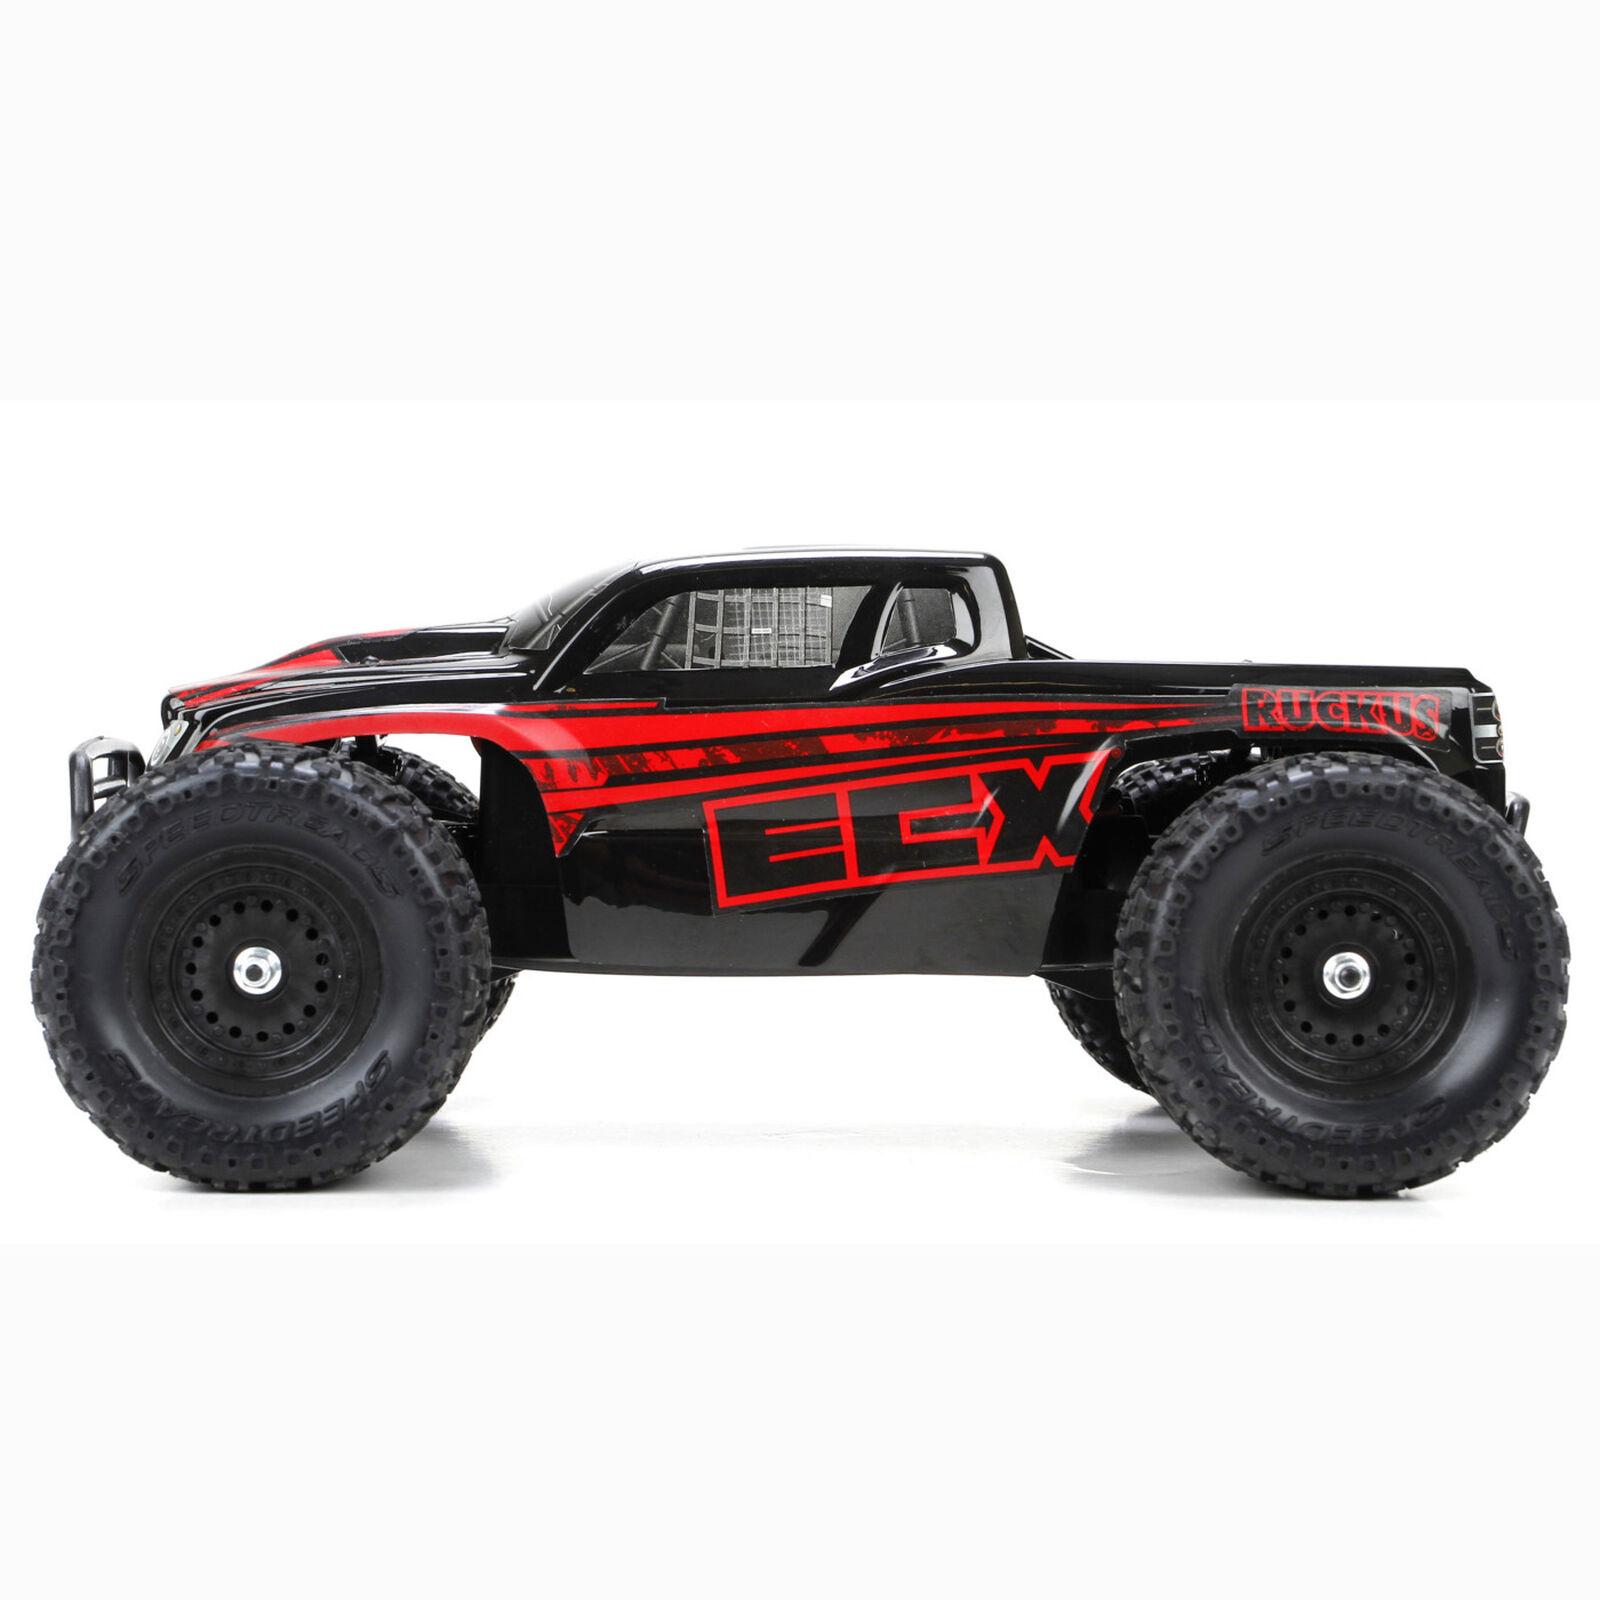 1/18 Ruckus 4WD Monster Truck RTR, Black/Red